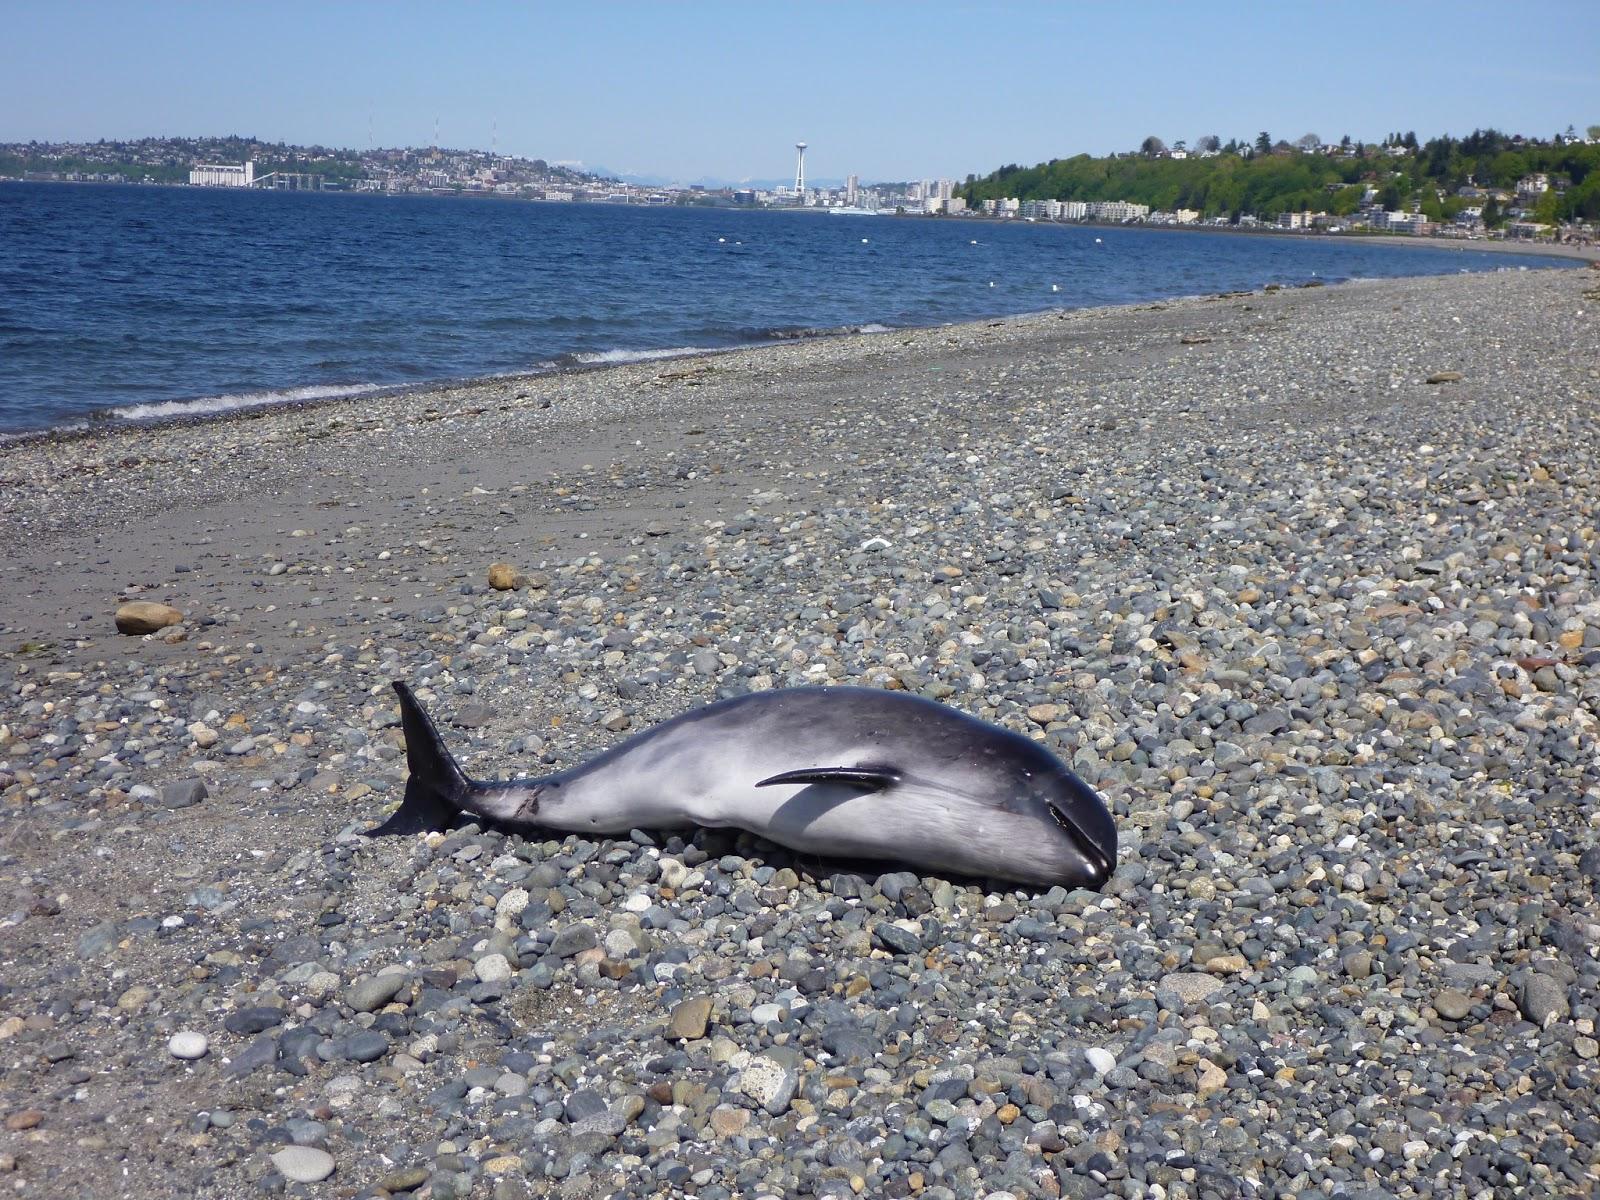 Harbor porpoise - photo#25